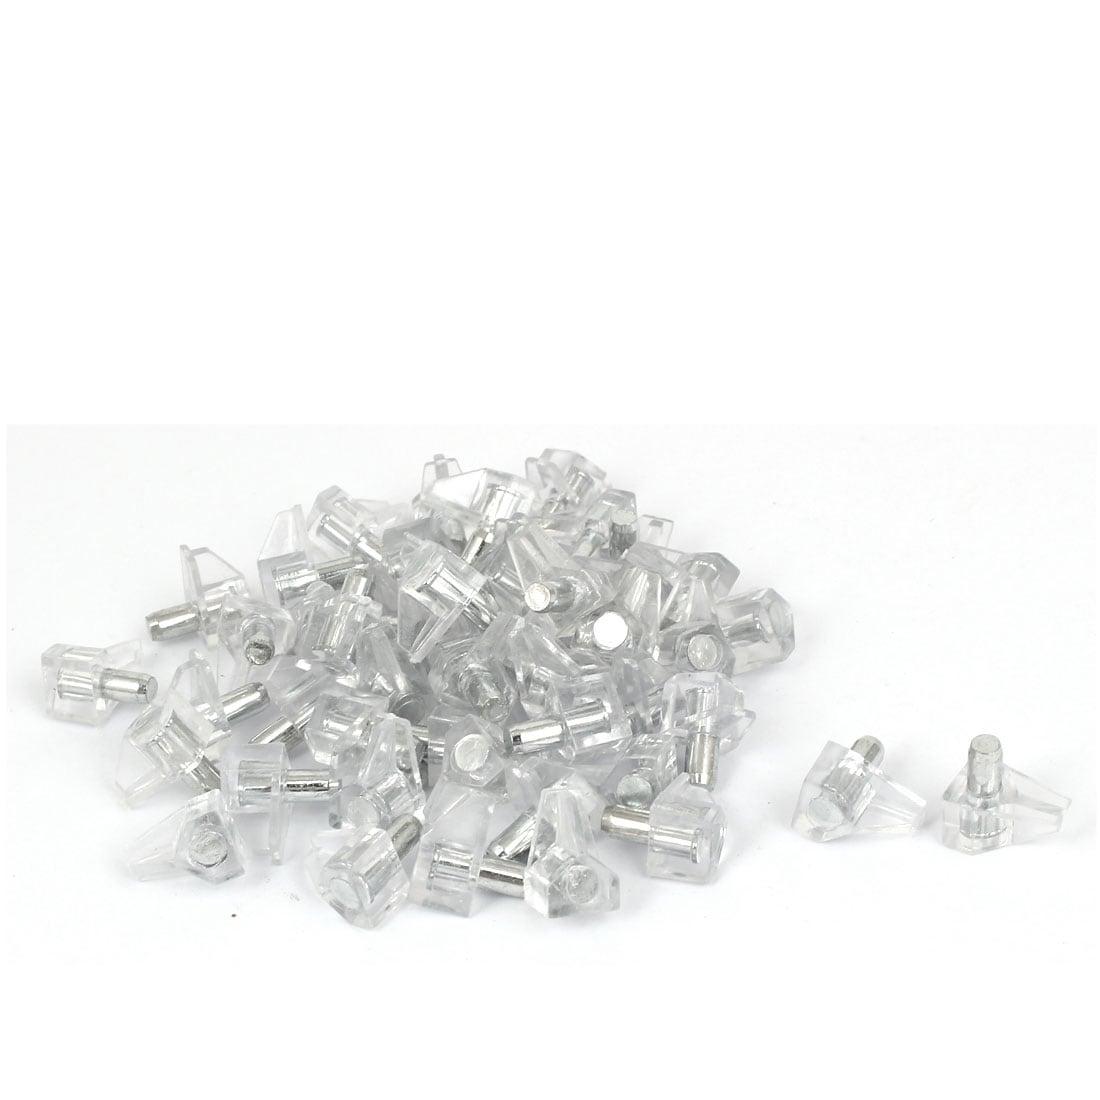 Kitchen Cabinet Shelves 5mm Metal Pin Plastic Shelf Supports Pegs Studs 50pcs Lib Fib Ugm Ac Id